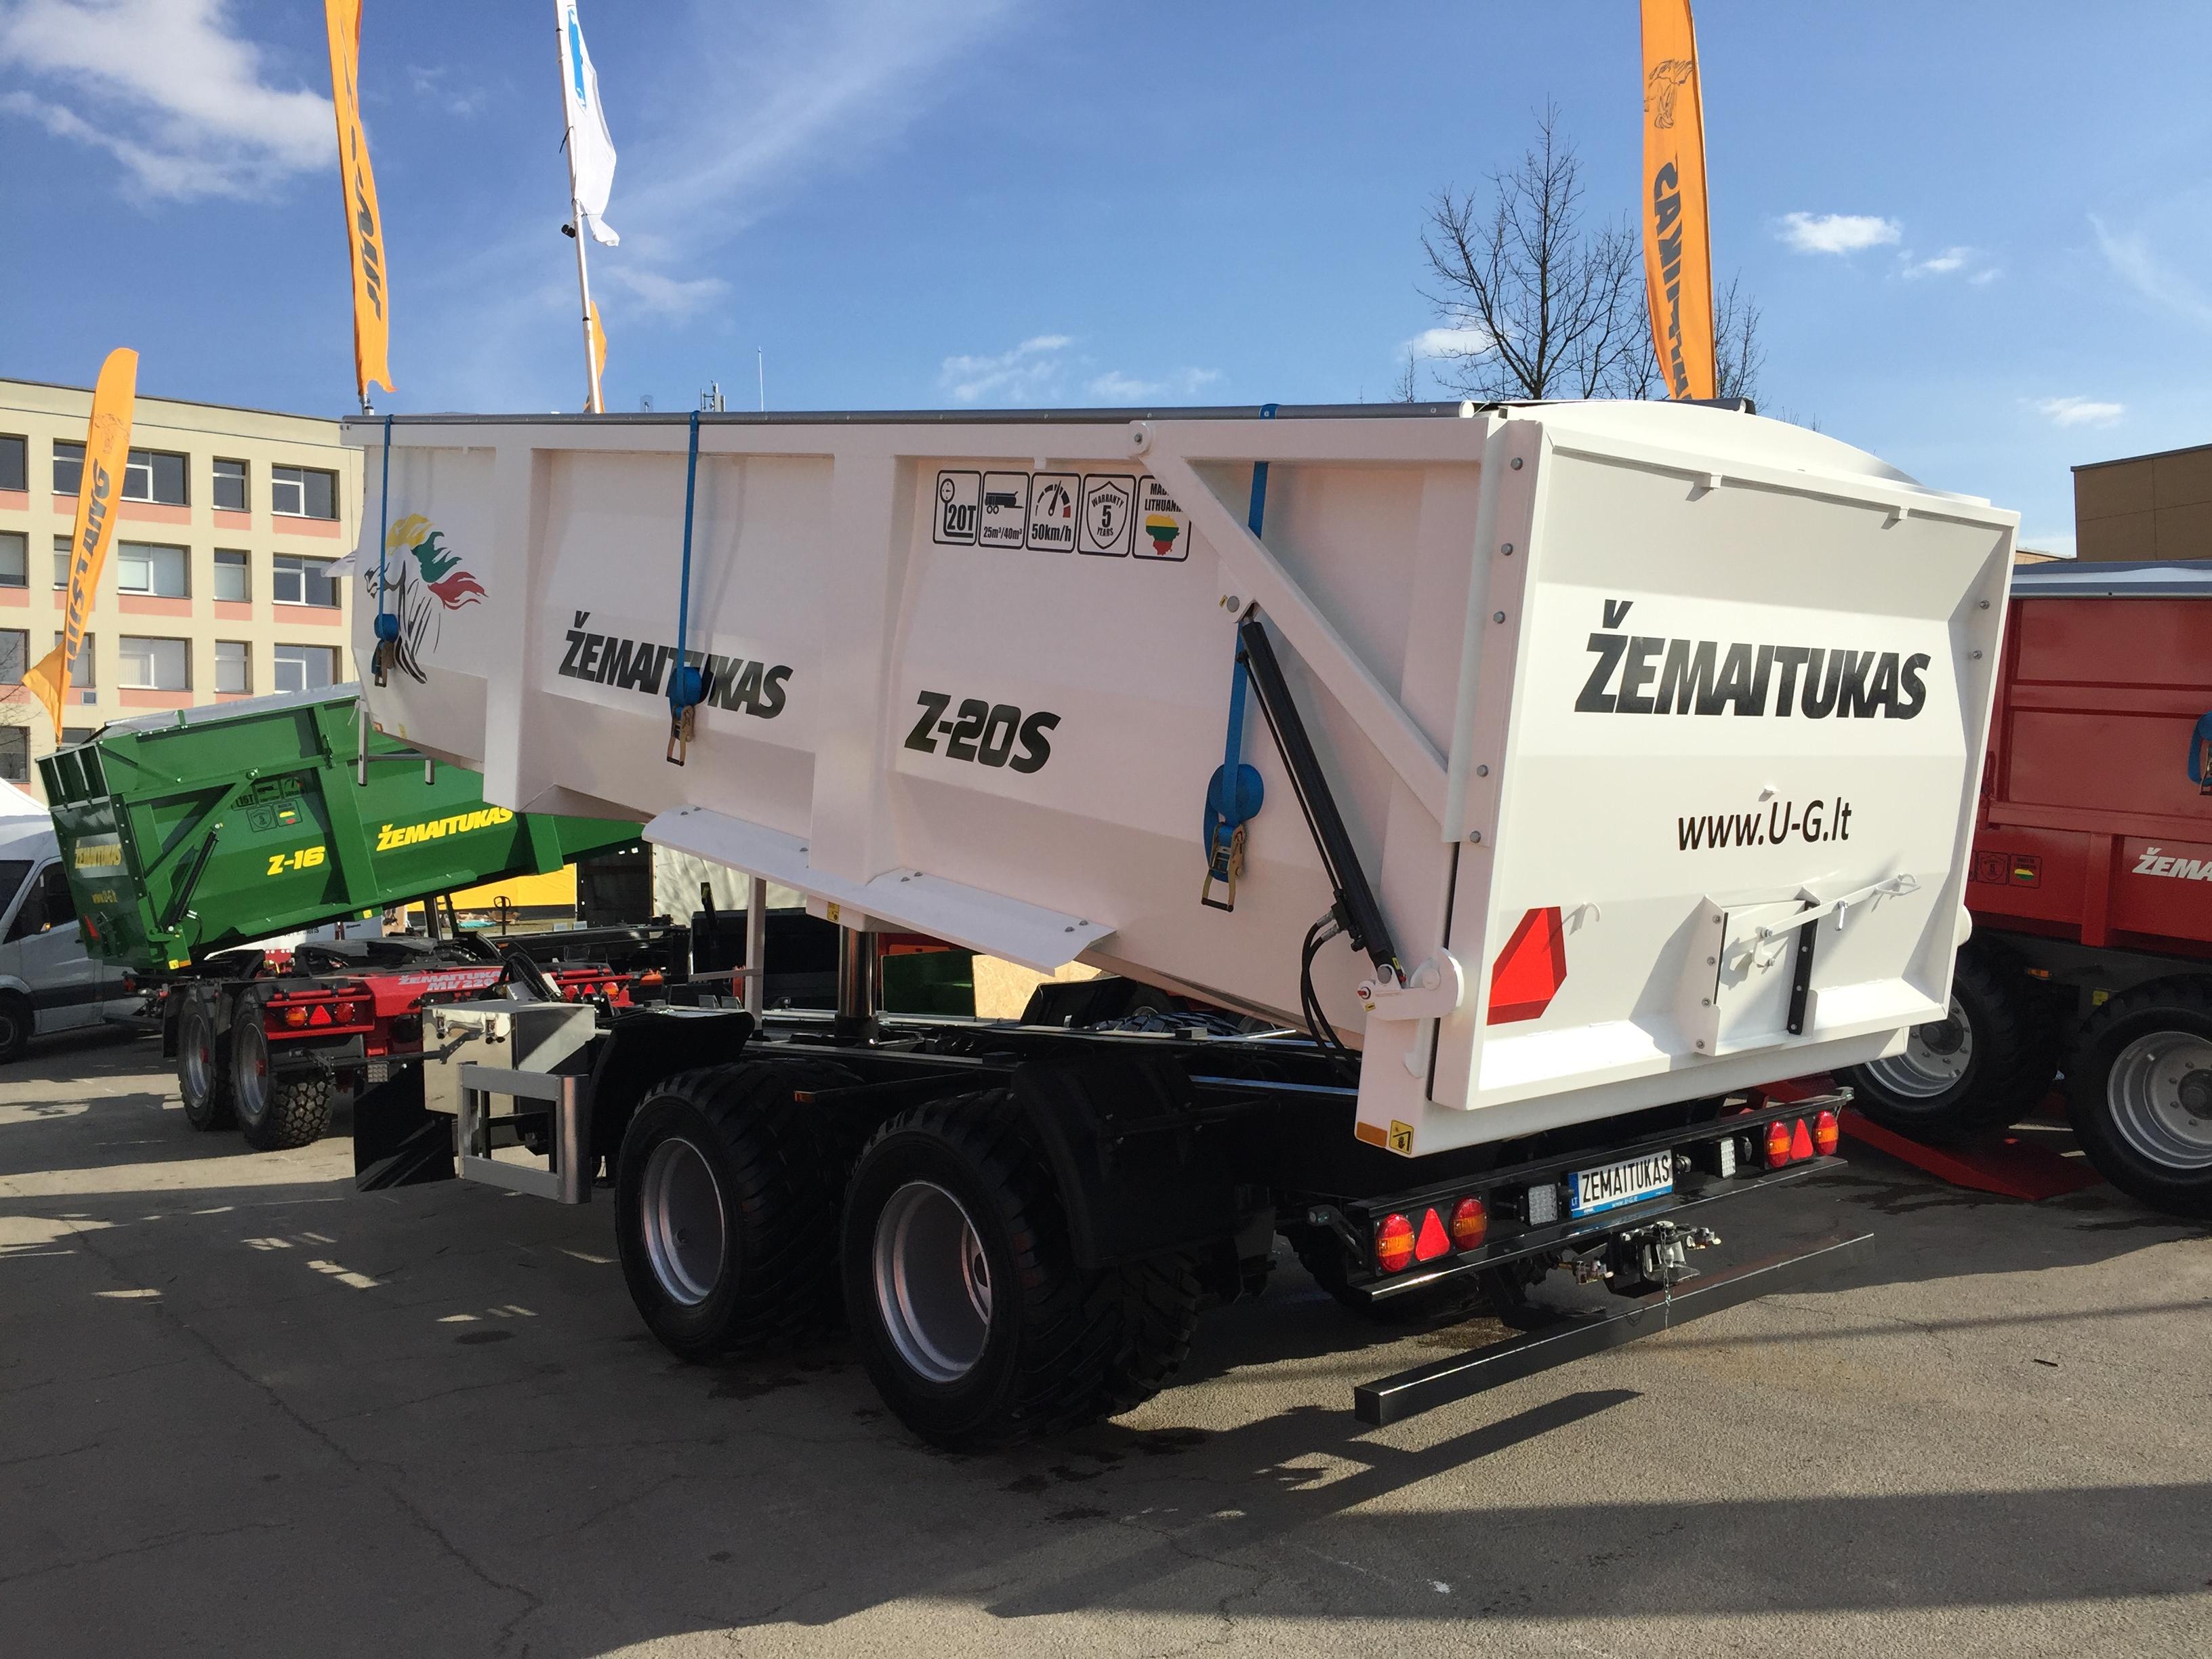 zemaitukas puspriekabe priekaba z-20 mustang trailer semitrailer universe group implemex carrype 5 year warranty  grain trailer grudu priekaba (5)